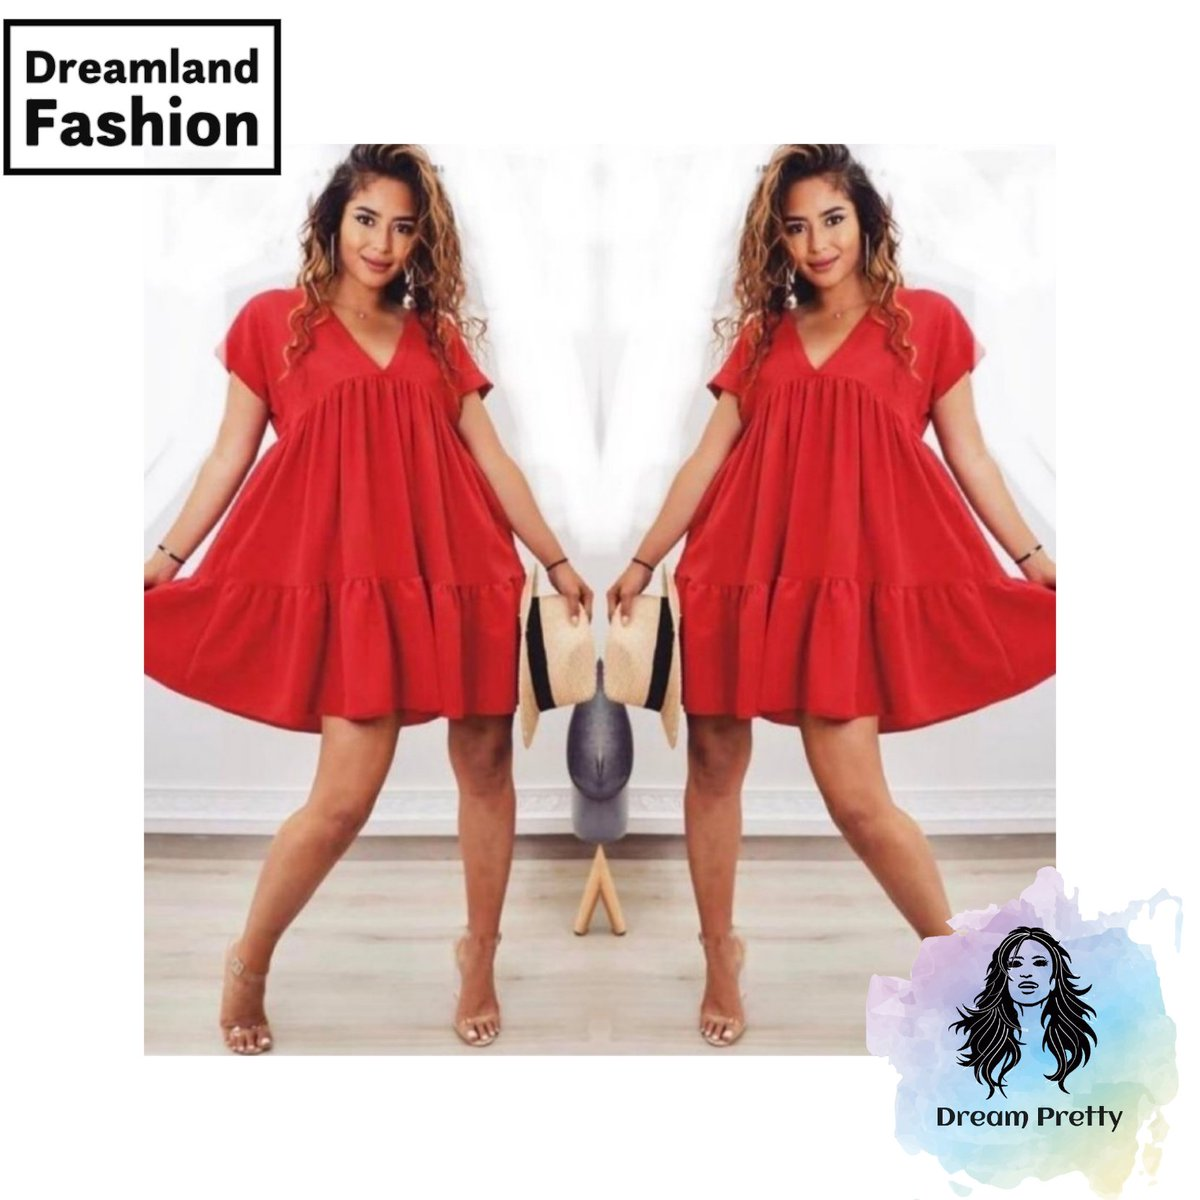 Ayla Smock Dress - Red  One size fits 8-18  https://cutt.ly/Ayla-Smock-Dress---Red…  #fashion #fashionblogger #fashionista #fashionstyle   #fashionable #fashionaddict #fashionlover #fashioninspo #fashionbloggers #fashionlovers #fashionworld #fashionblogger_depic.twitter.com/c9uAvp7J6E